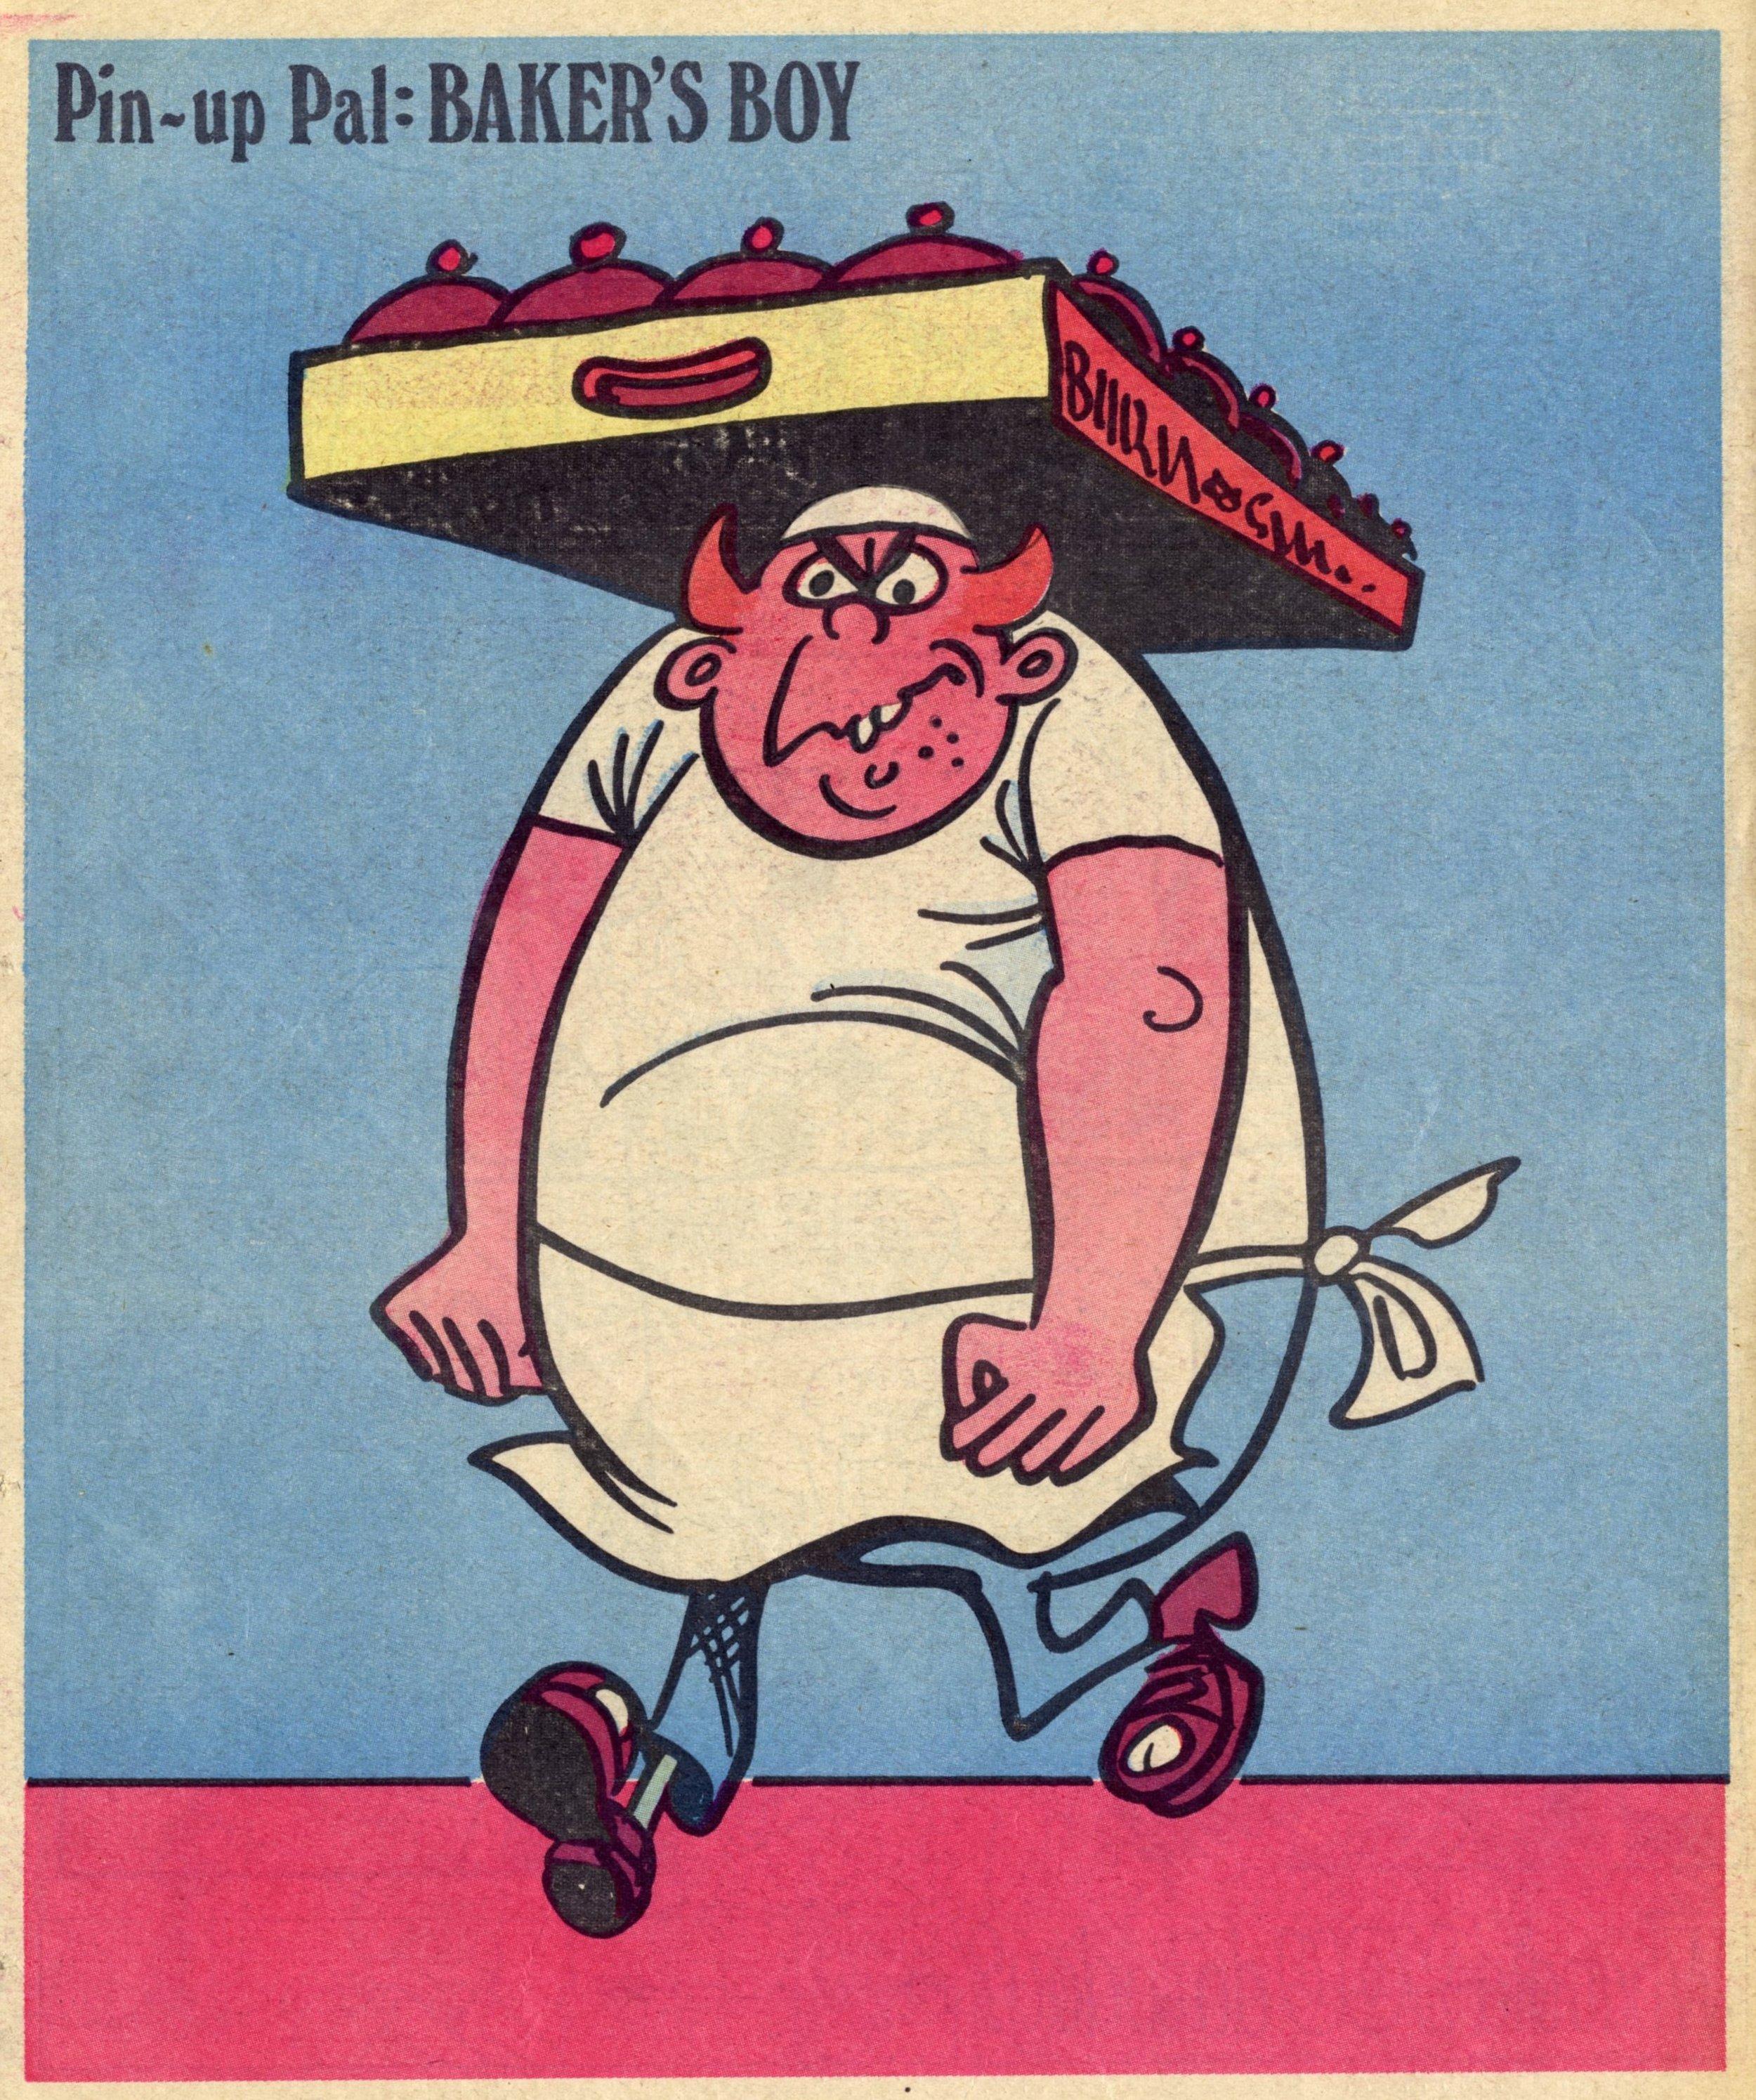 Pin-up Pal: Baker's Boy (artist Frank McDiarmid), 10 February 1979